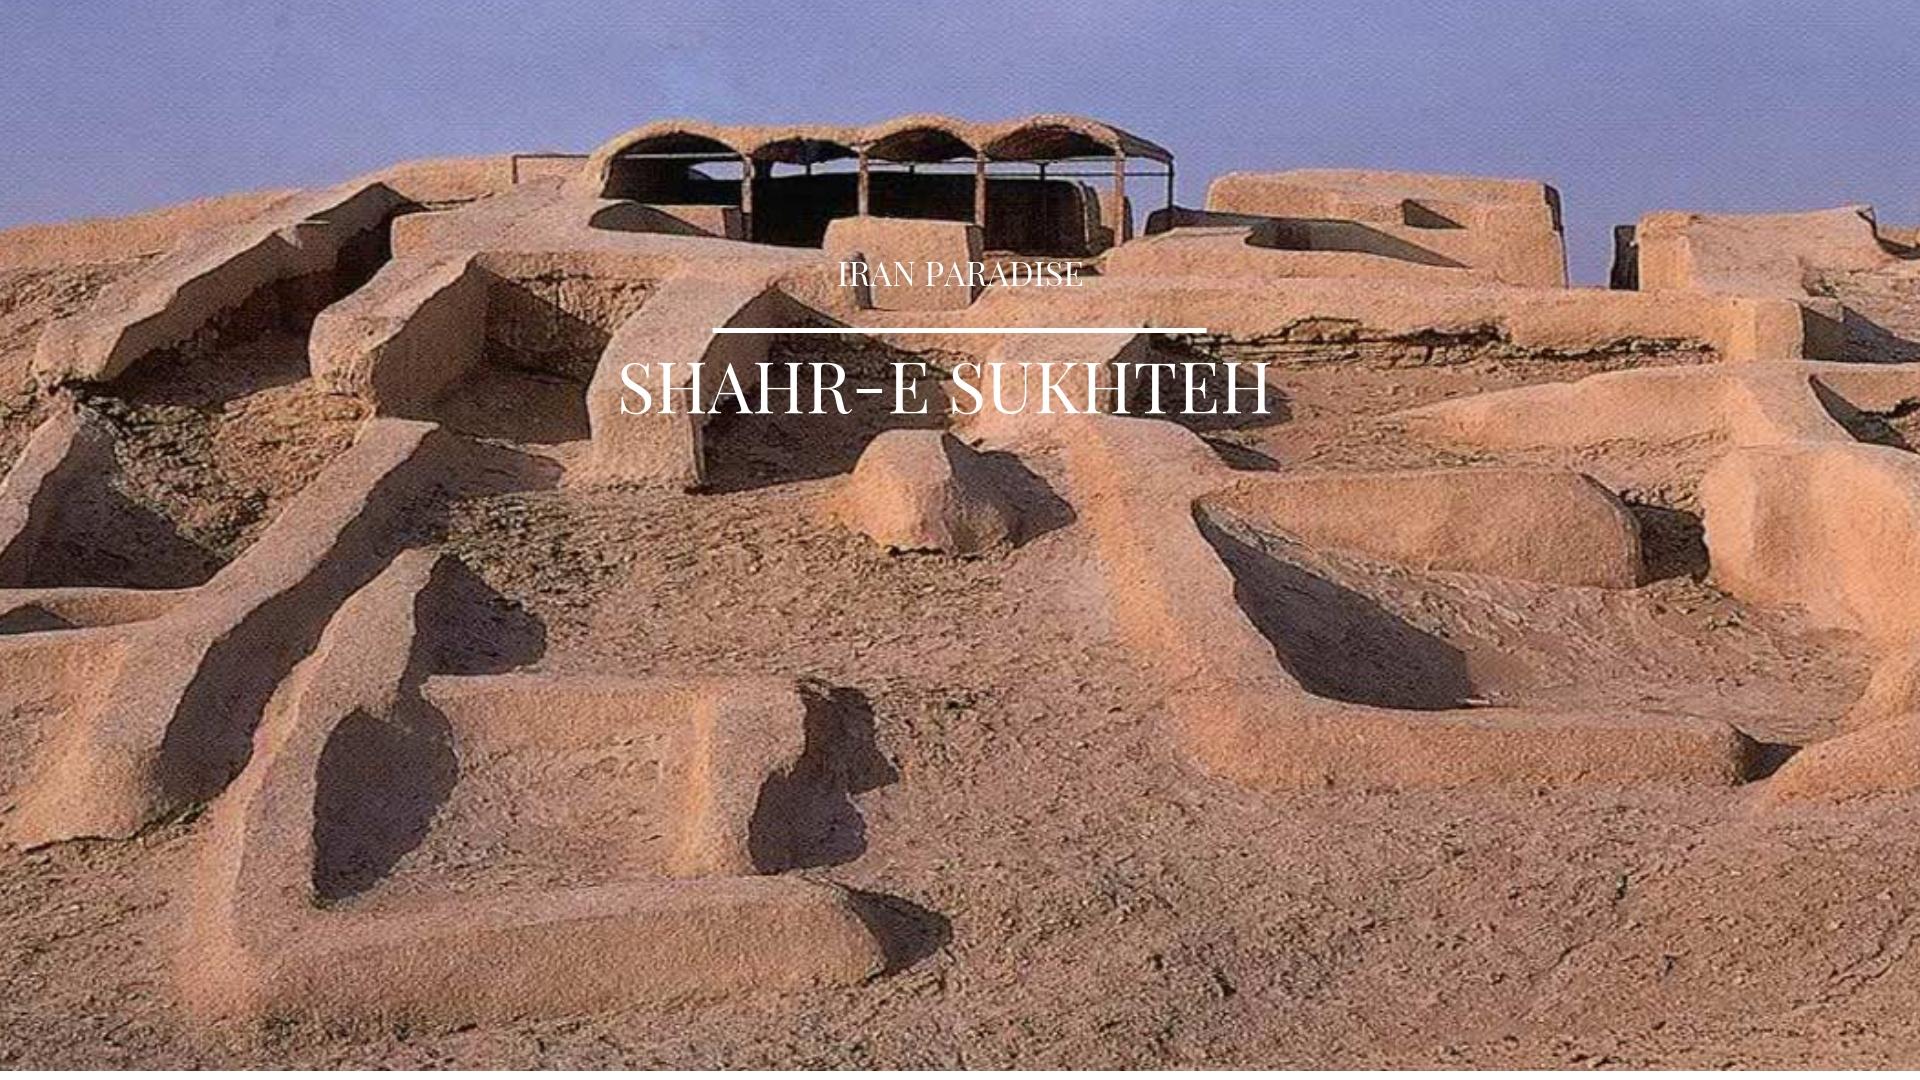 Shahr-e Sukhteh